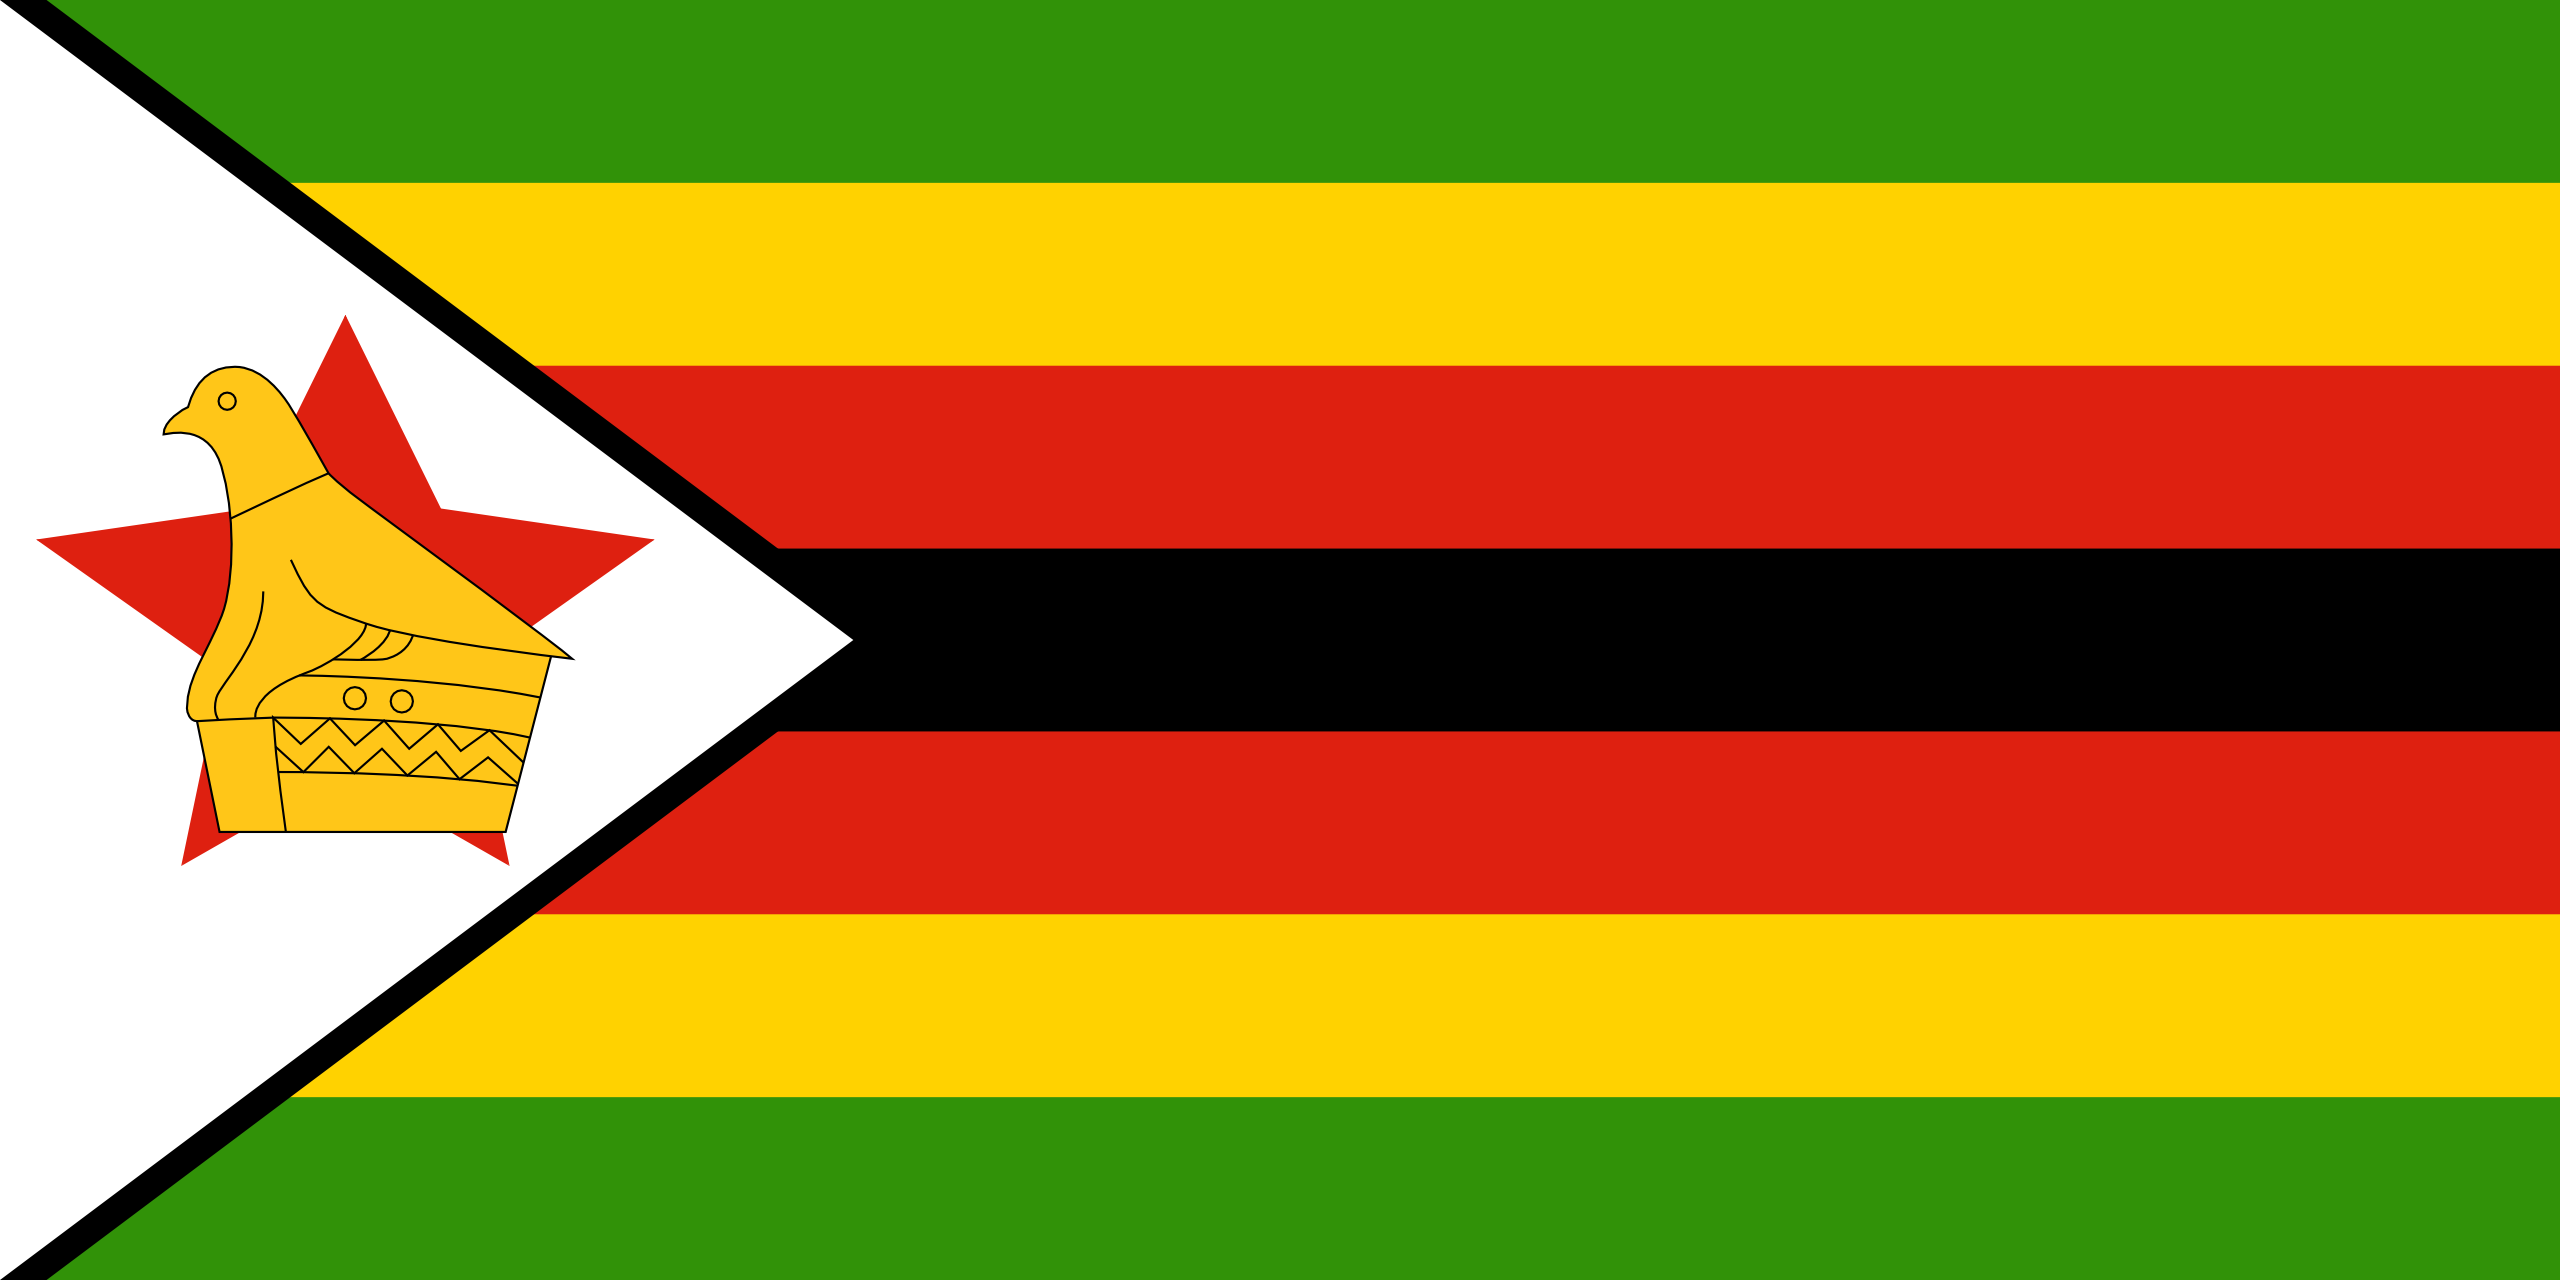 zimbabue, χώρα, έμβλημα, λογότυπο, σύμβολο - Wallpapers HD - Professor-falken.com